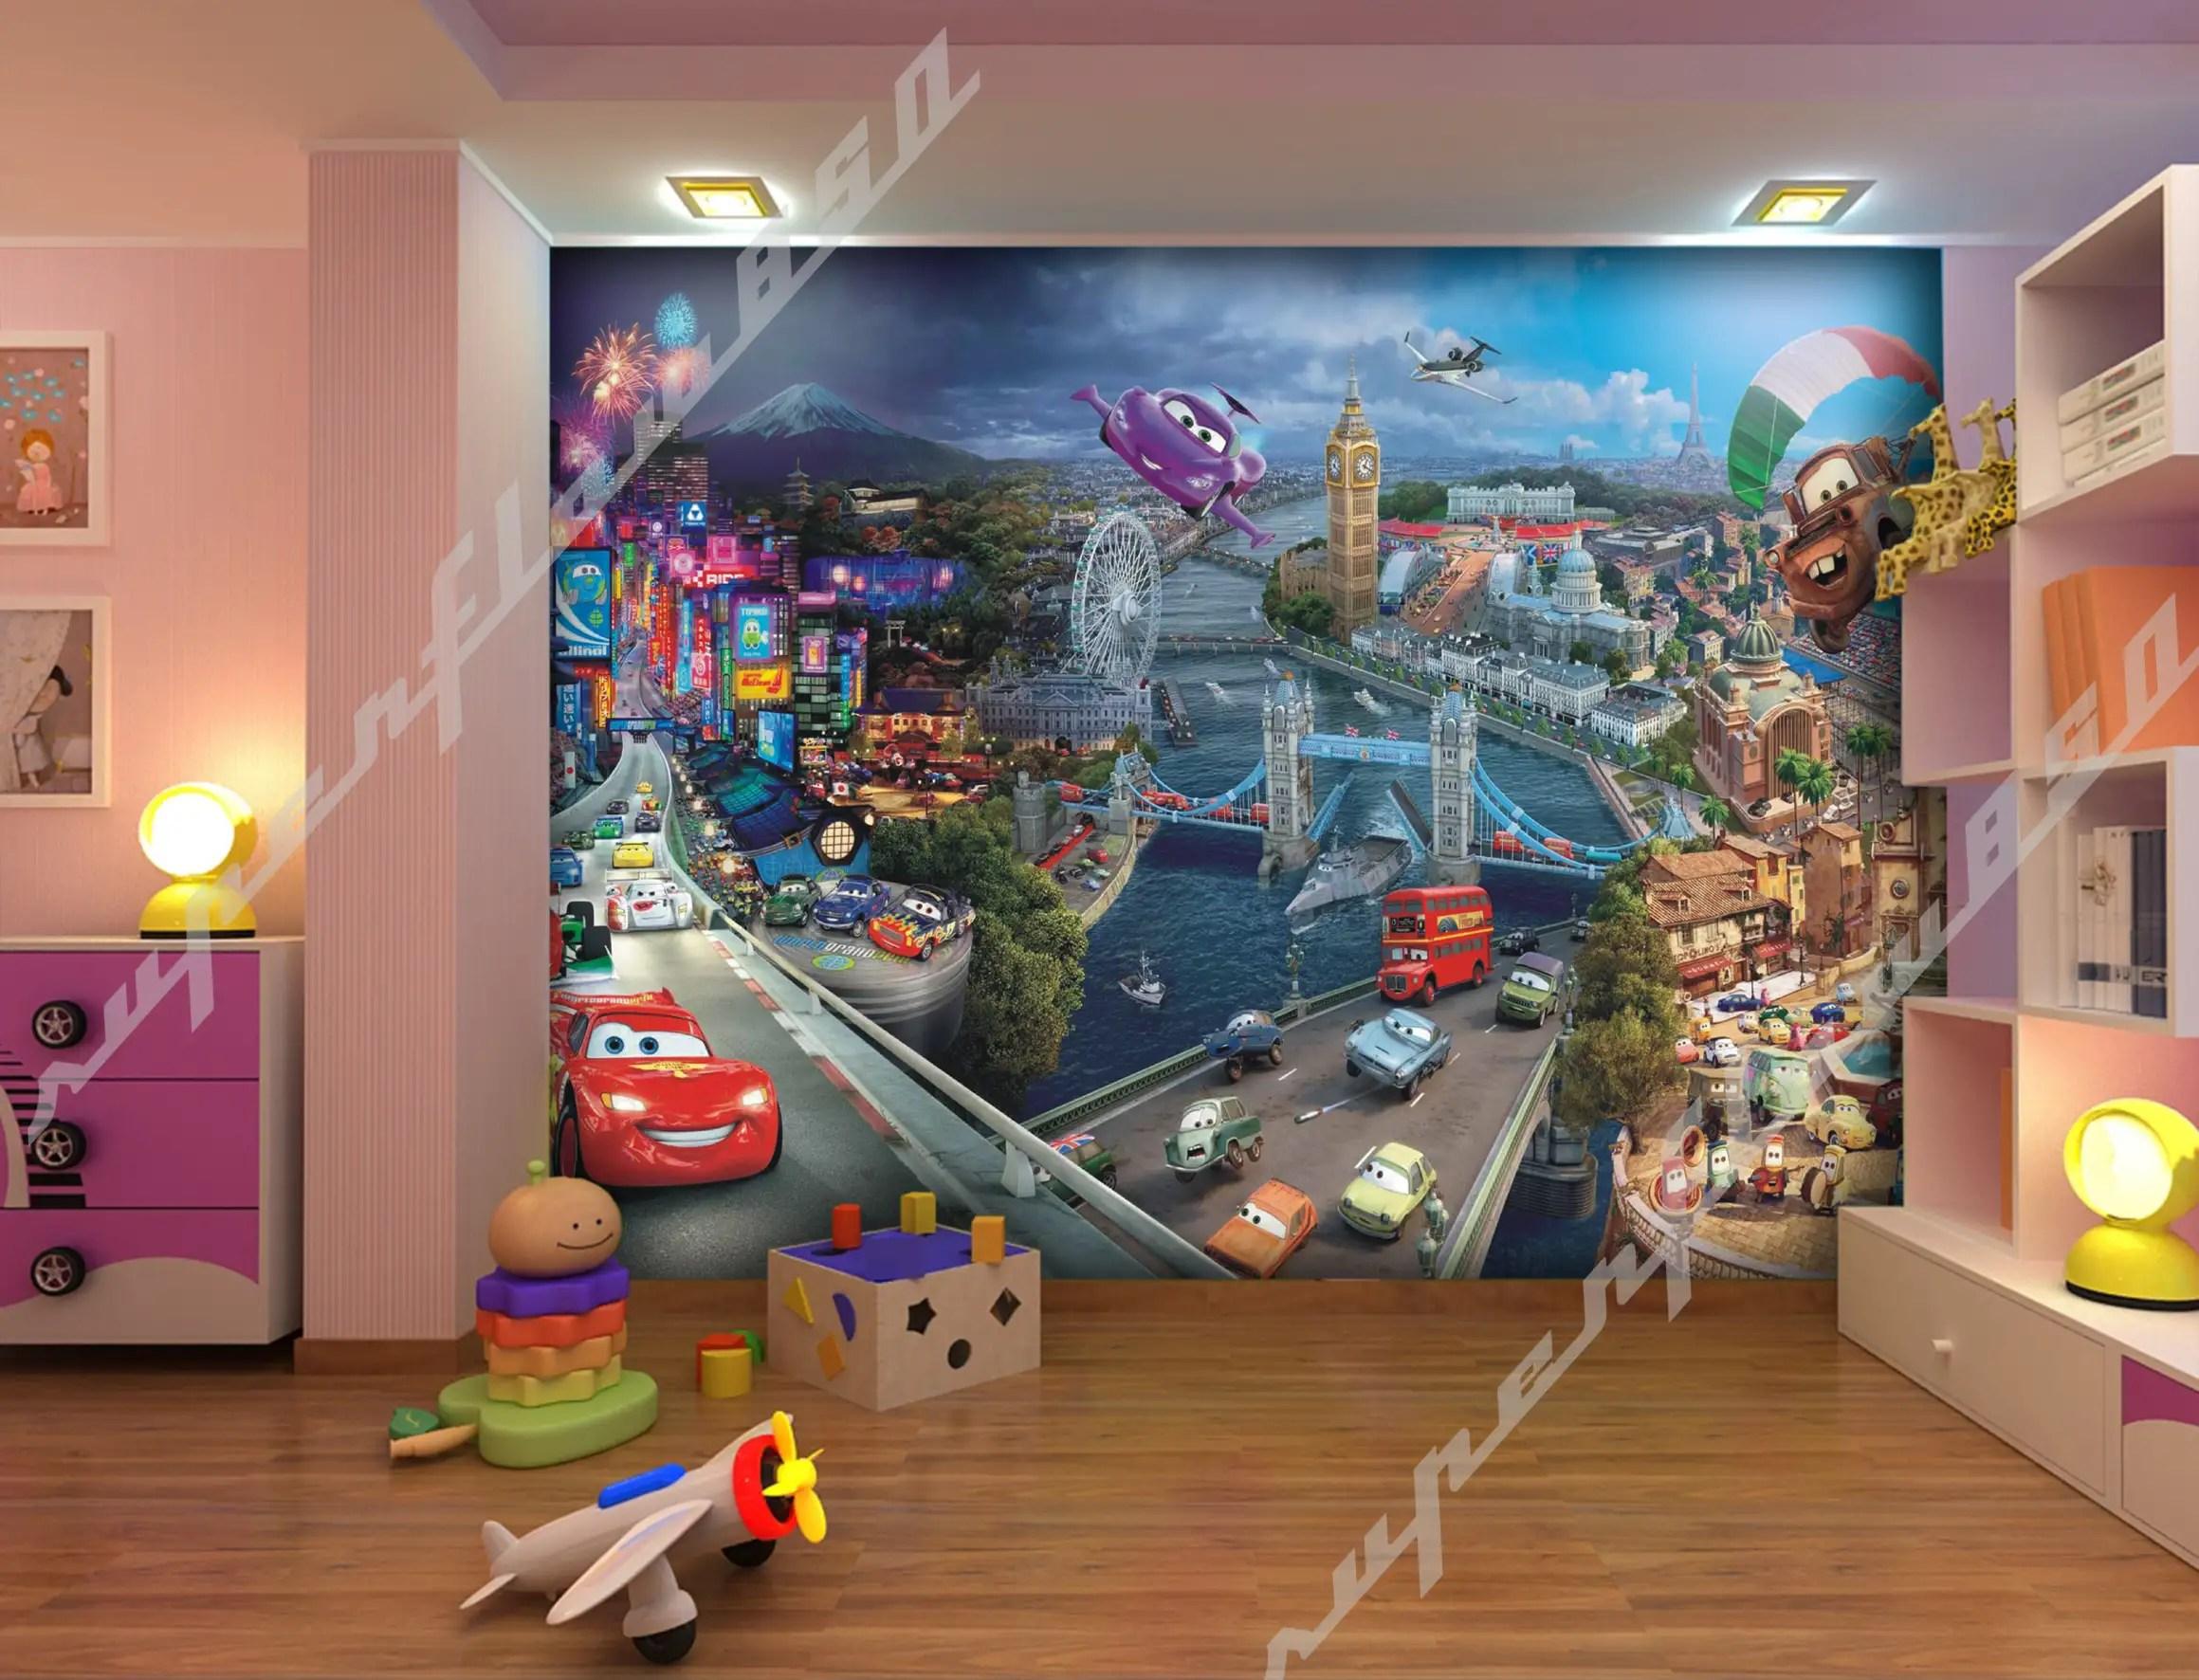 Disney Cars Mural Wallpaper Ebay Cars World Disney Pixar Photo Wallpaper Wall Mural Kids